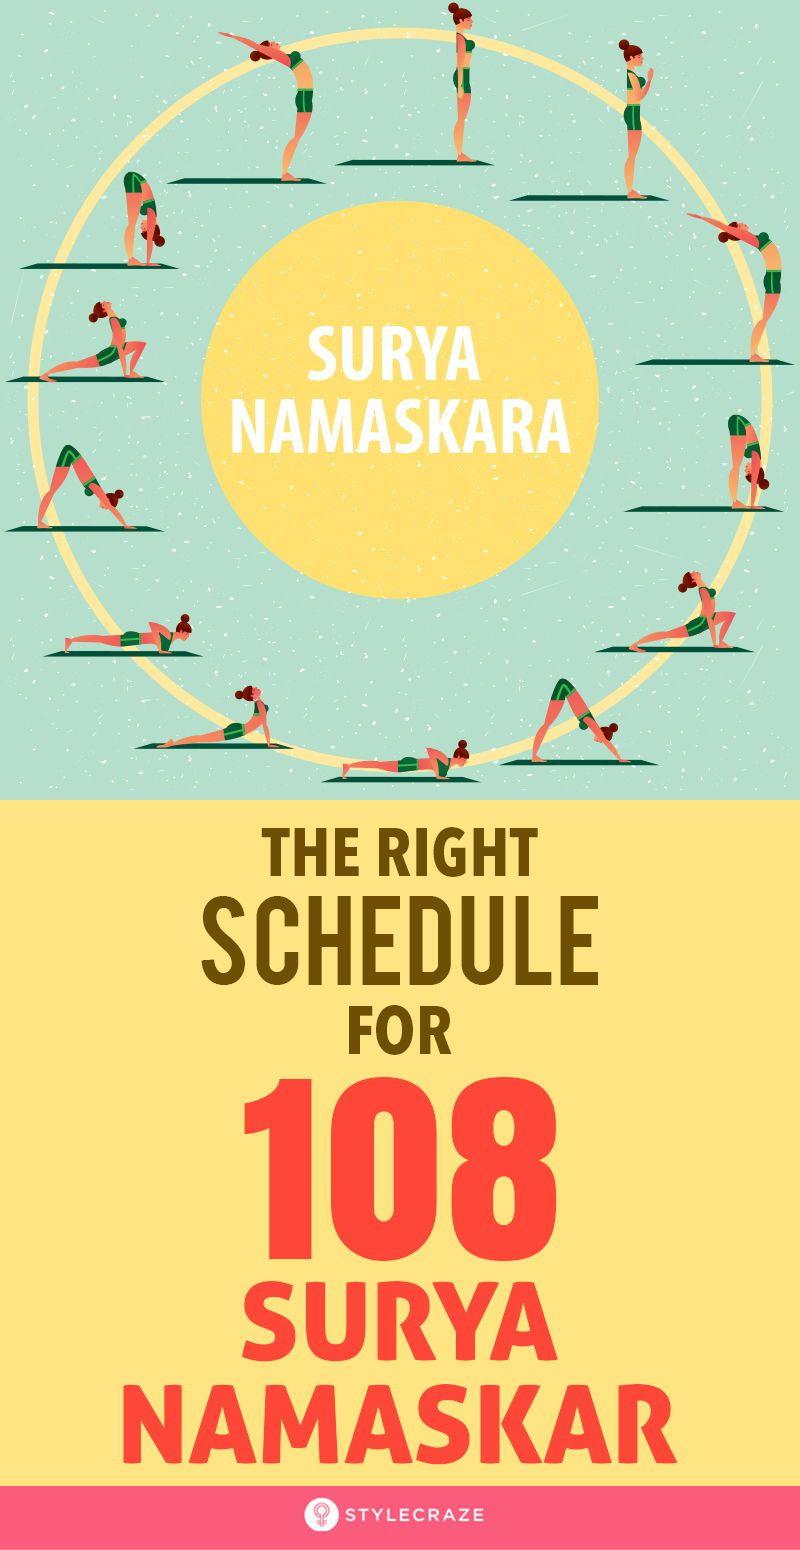 108 Surya Namaskar What Is The Right Schedule To Follow Surya Namaskar Surya Namaskar Challenge Surya Namaskara